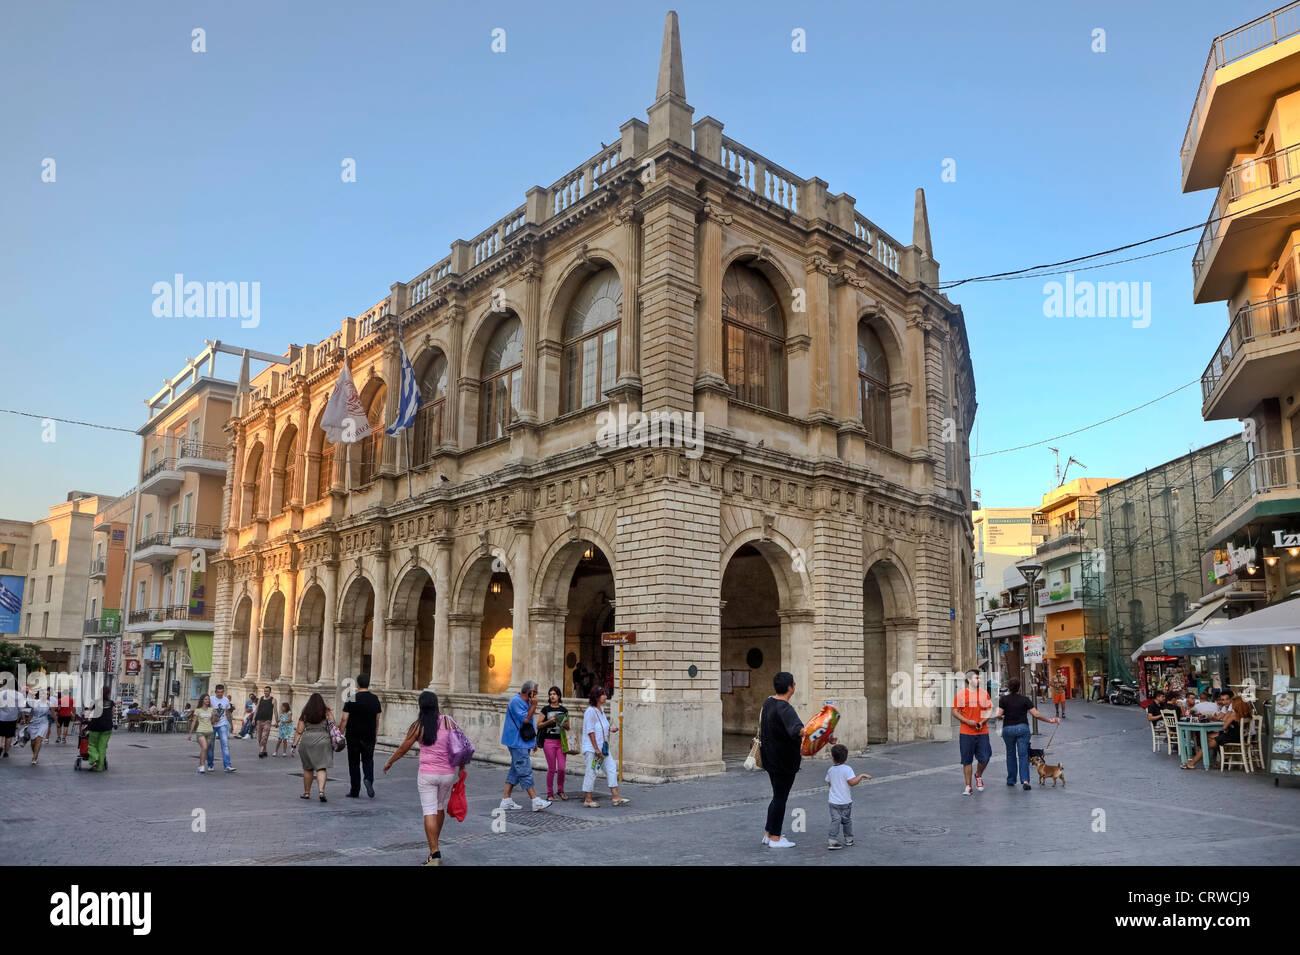 Venetian Loggia, Heraklion, Crete, Greece - Stock Image